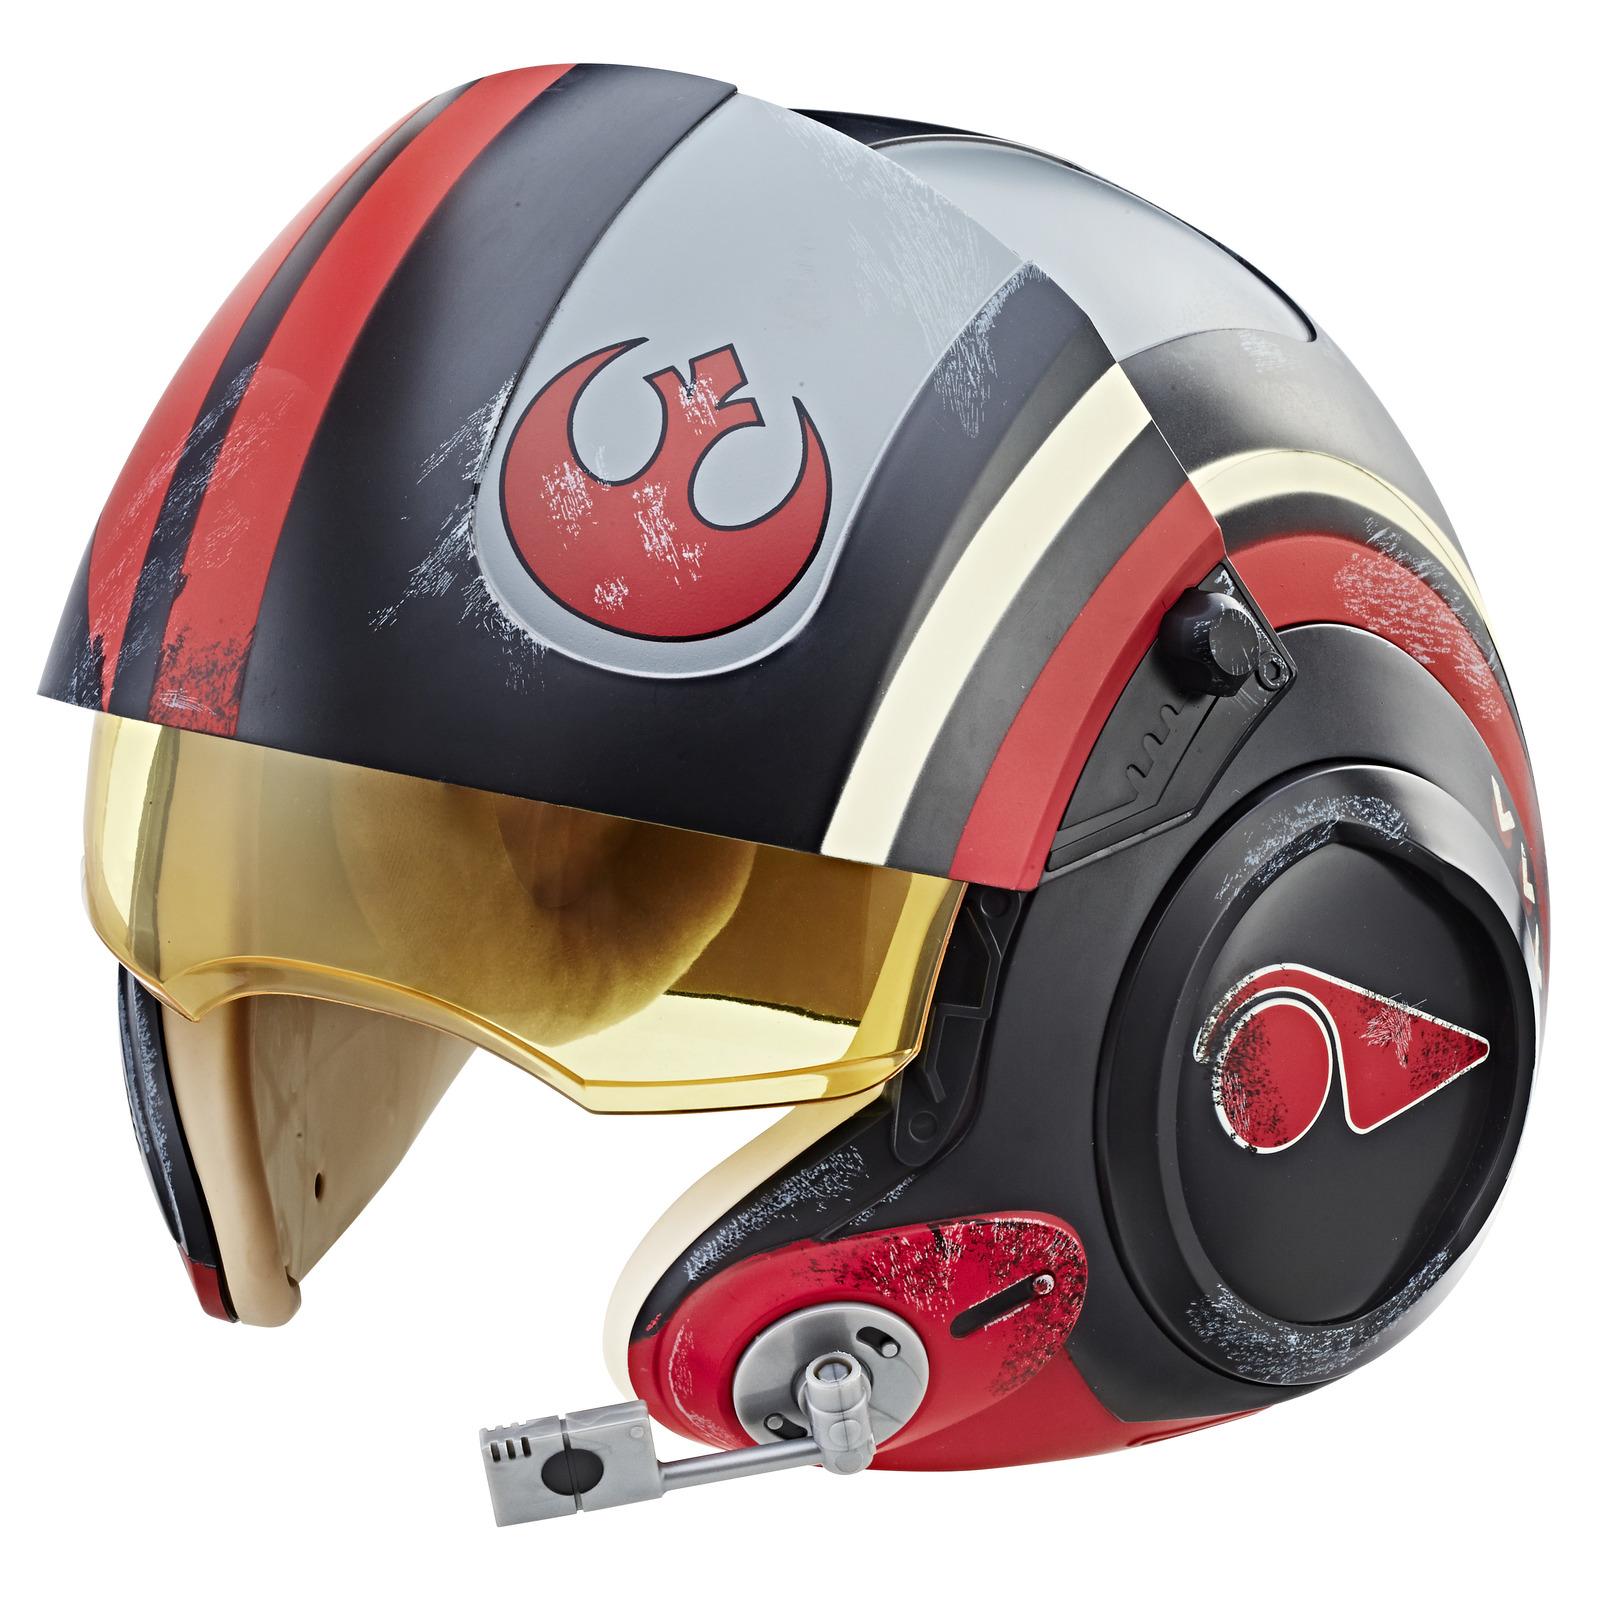 Star Wars: The Black Series - Poe Dameron Electronic Helmet image